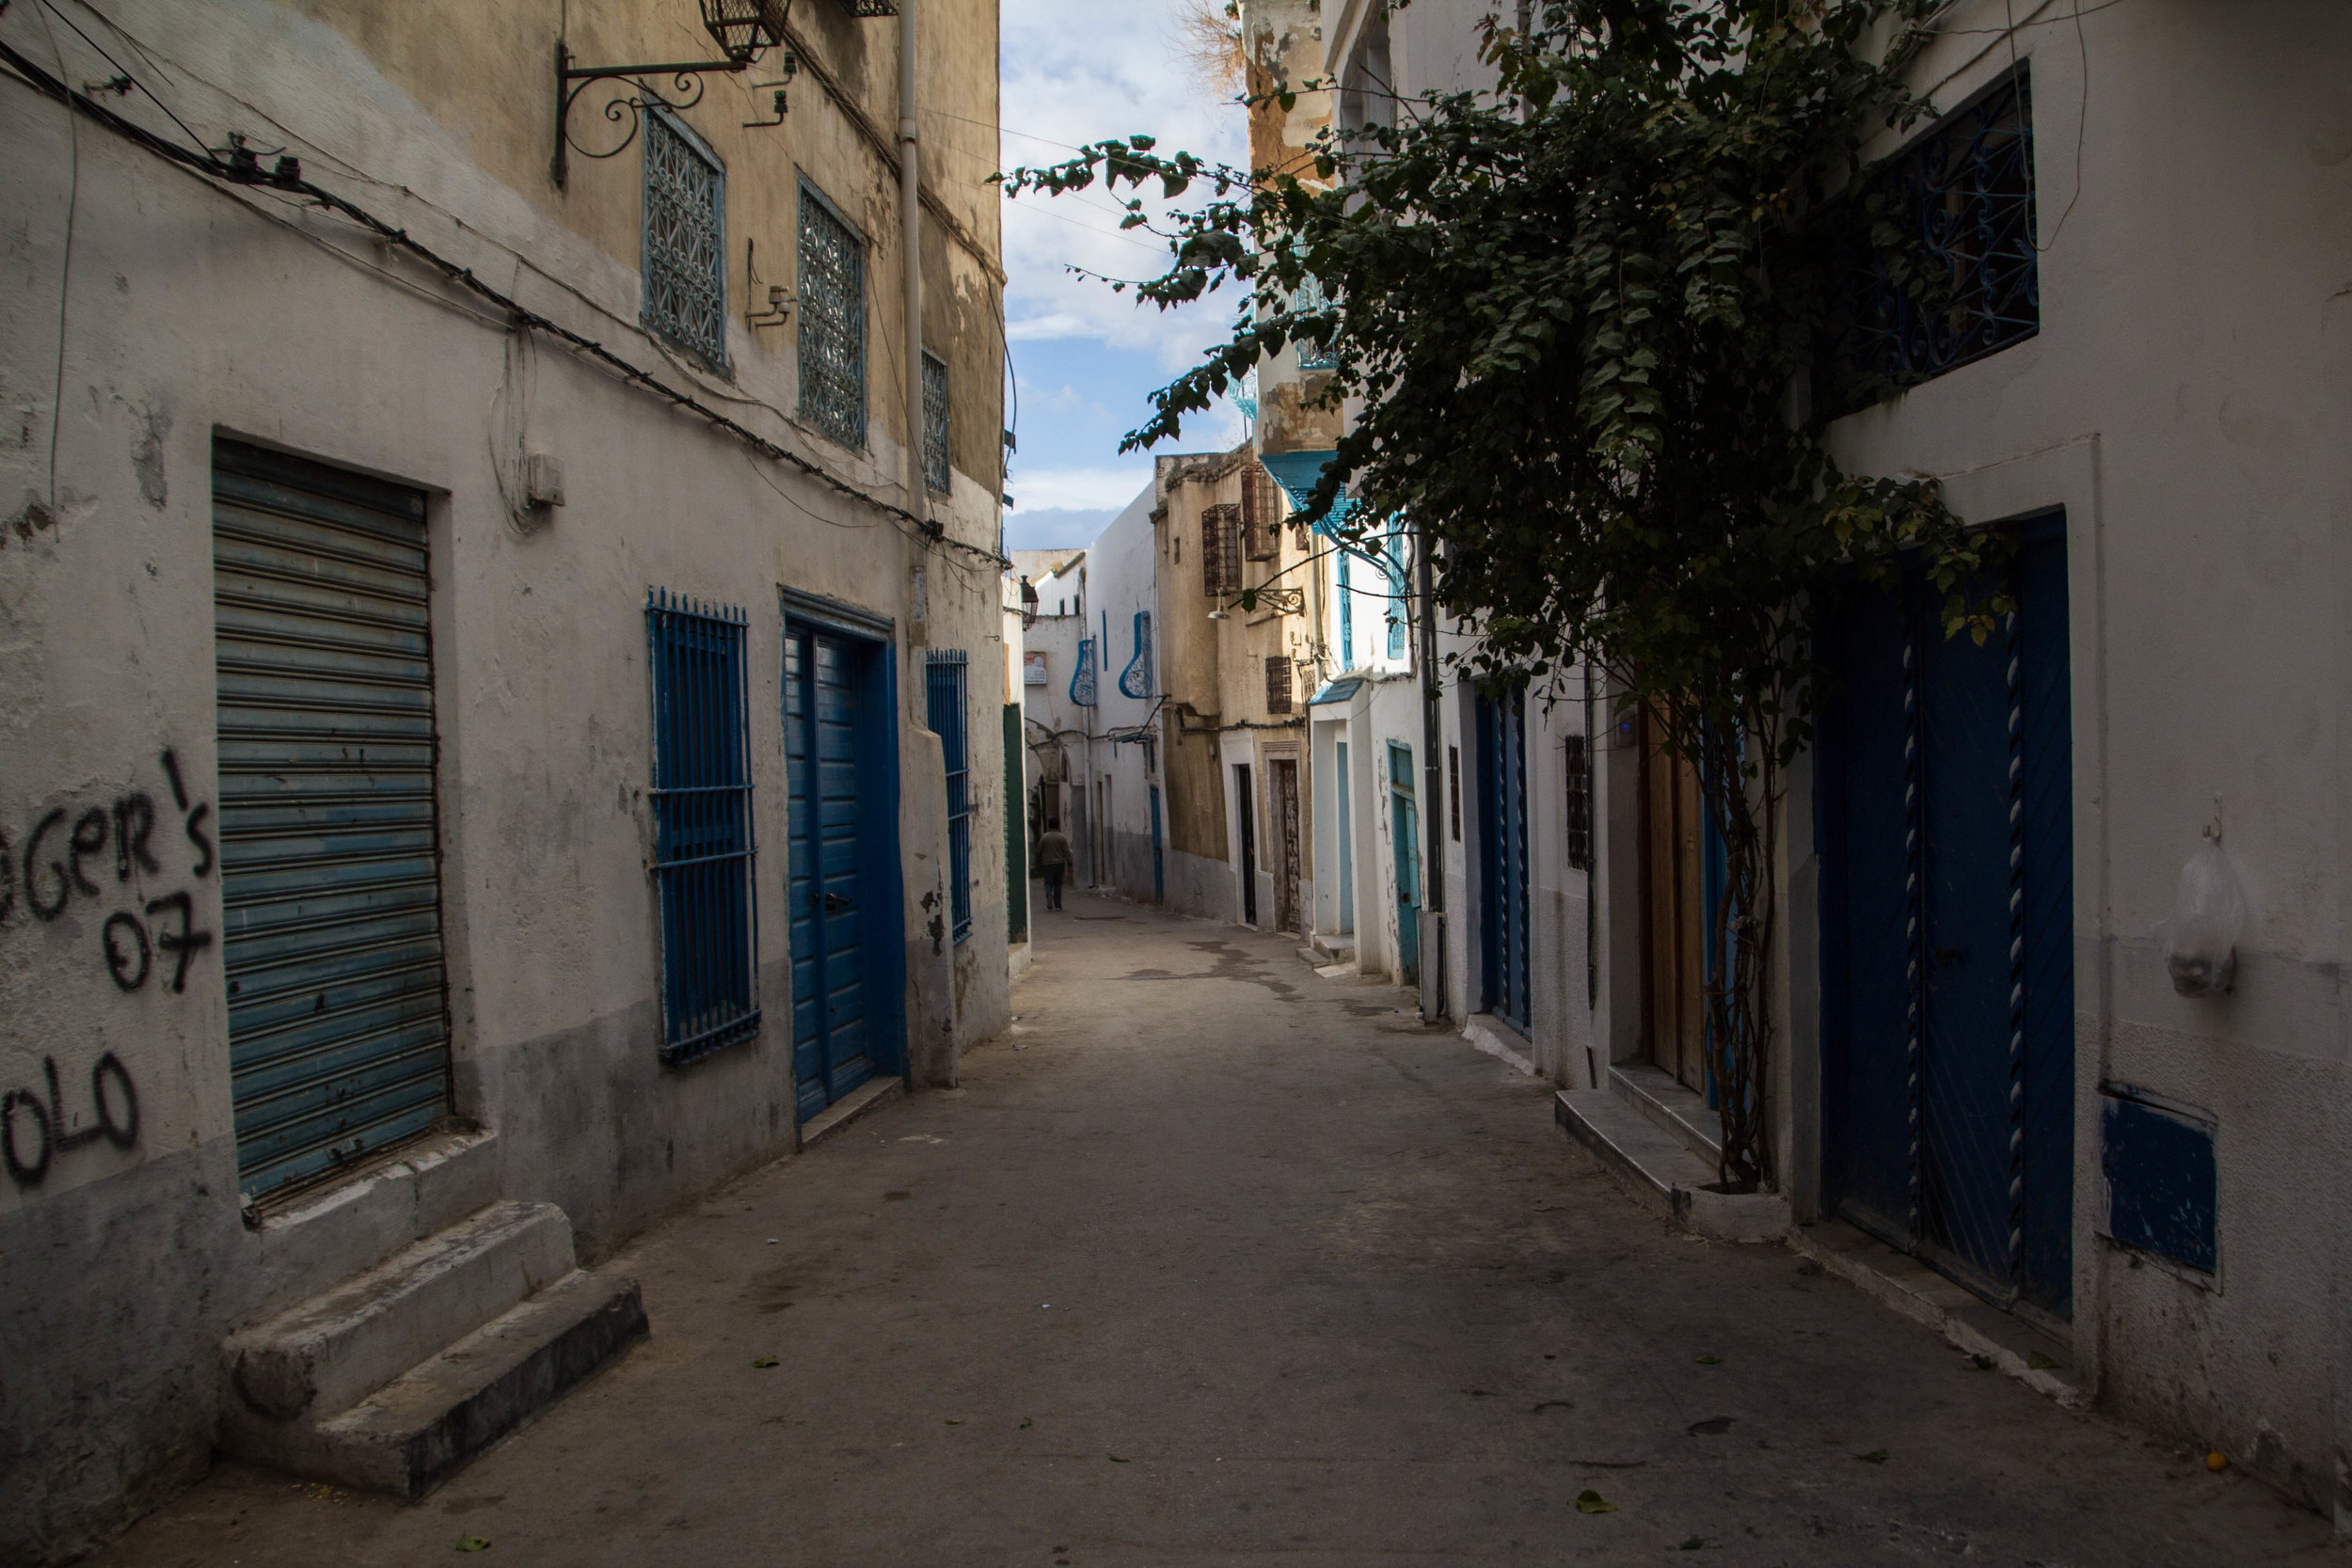 medina-photography-tunis-tunisia-21.jpg